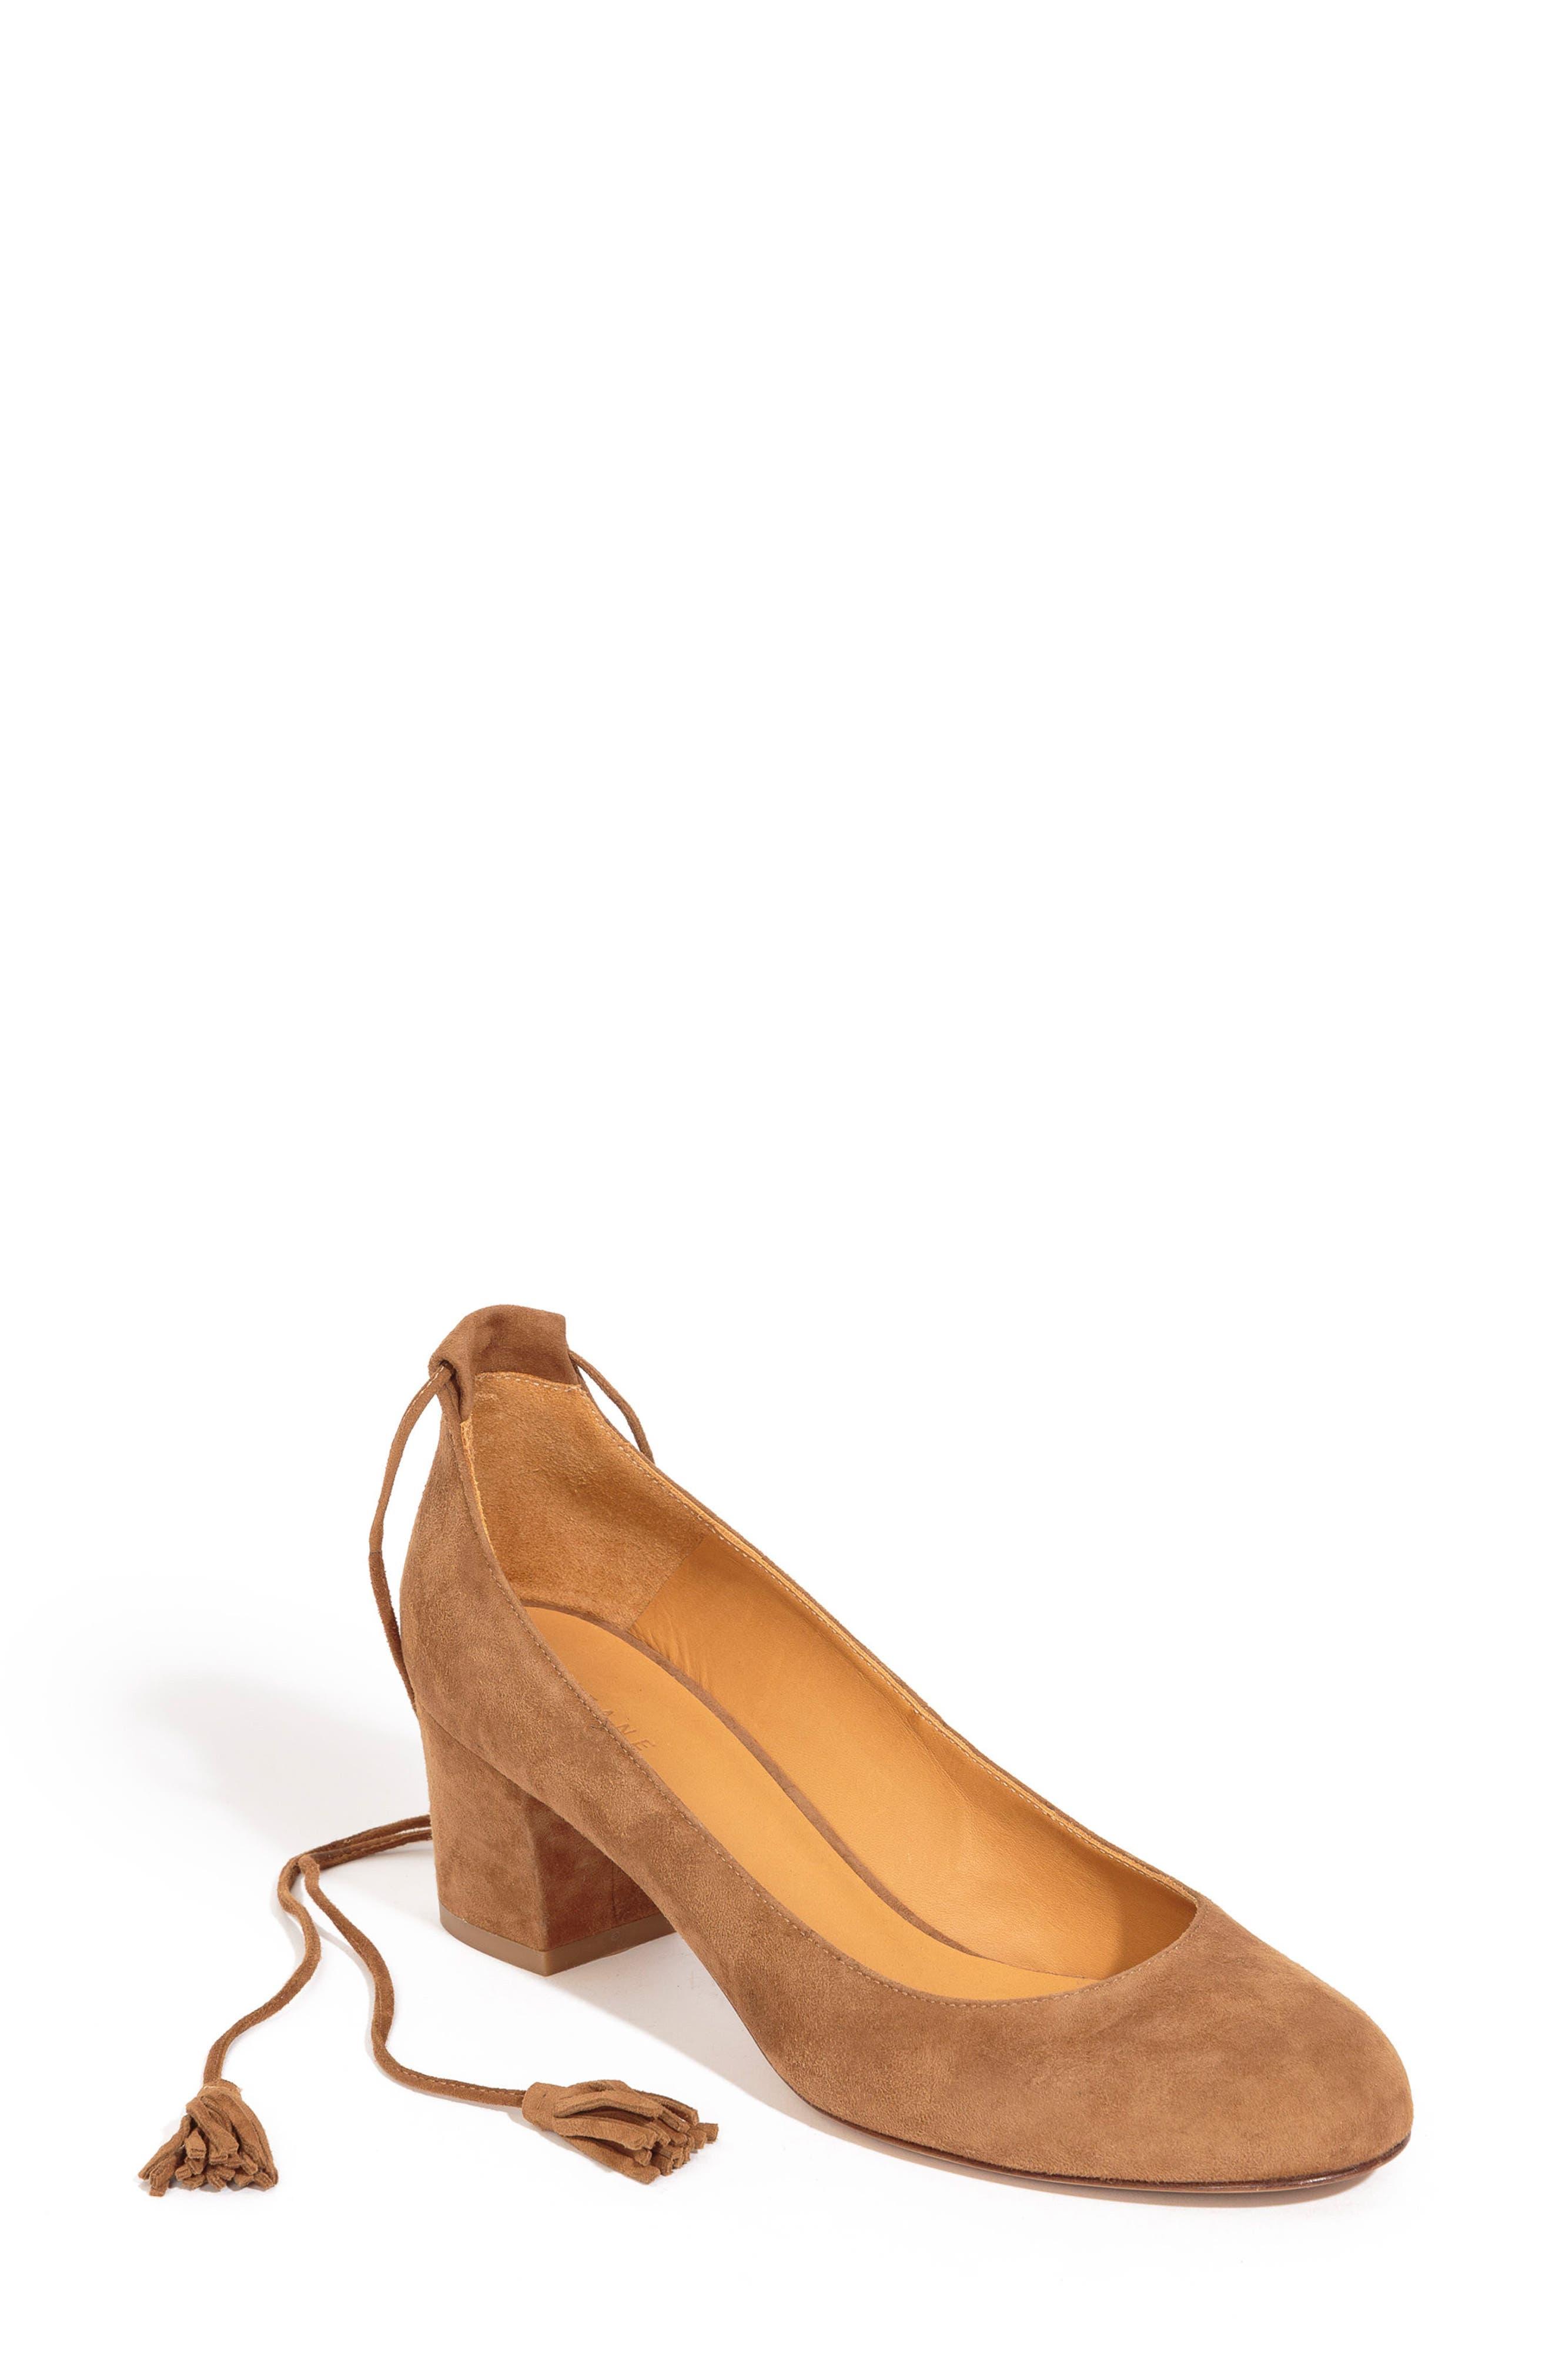 Valentina Ankle Wrap Pump,                         Main,                         color, HAZELNUT BROWN SUEDE